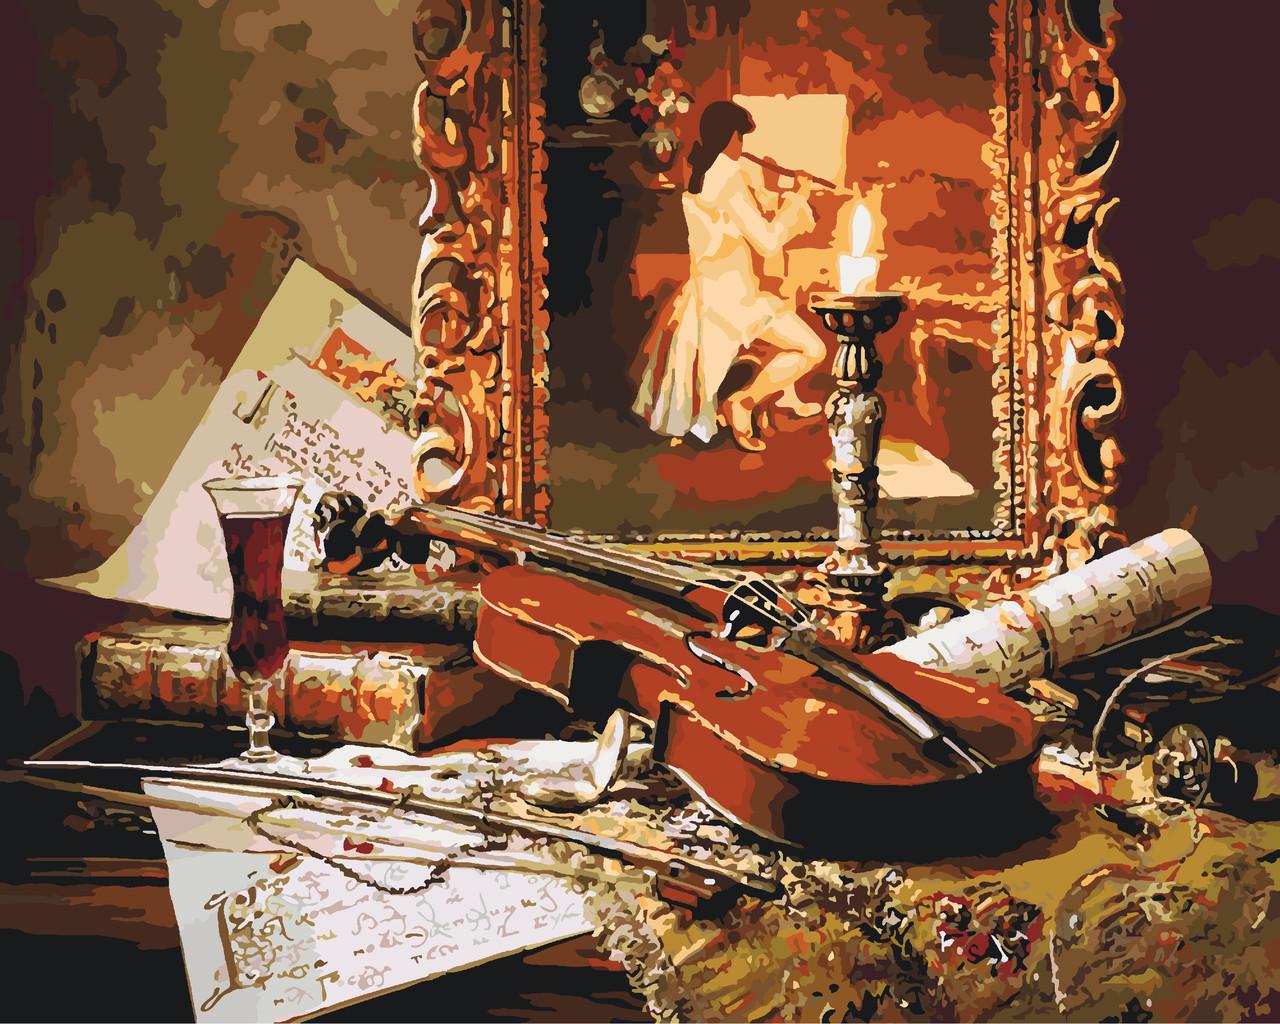 Картина по номерам Звучание скрипки, 40х50 см., Идейка